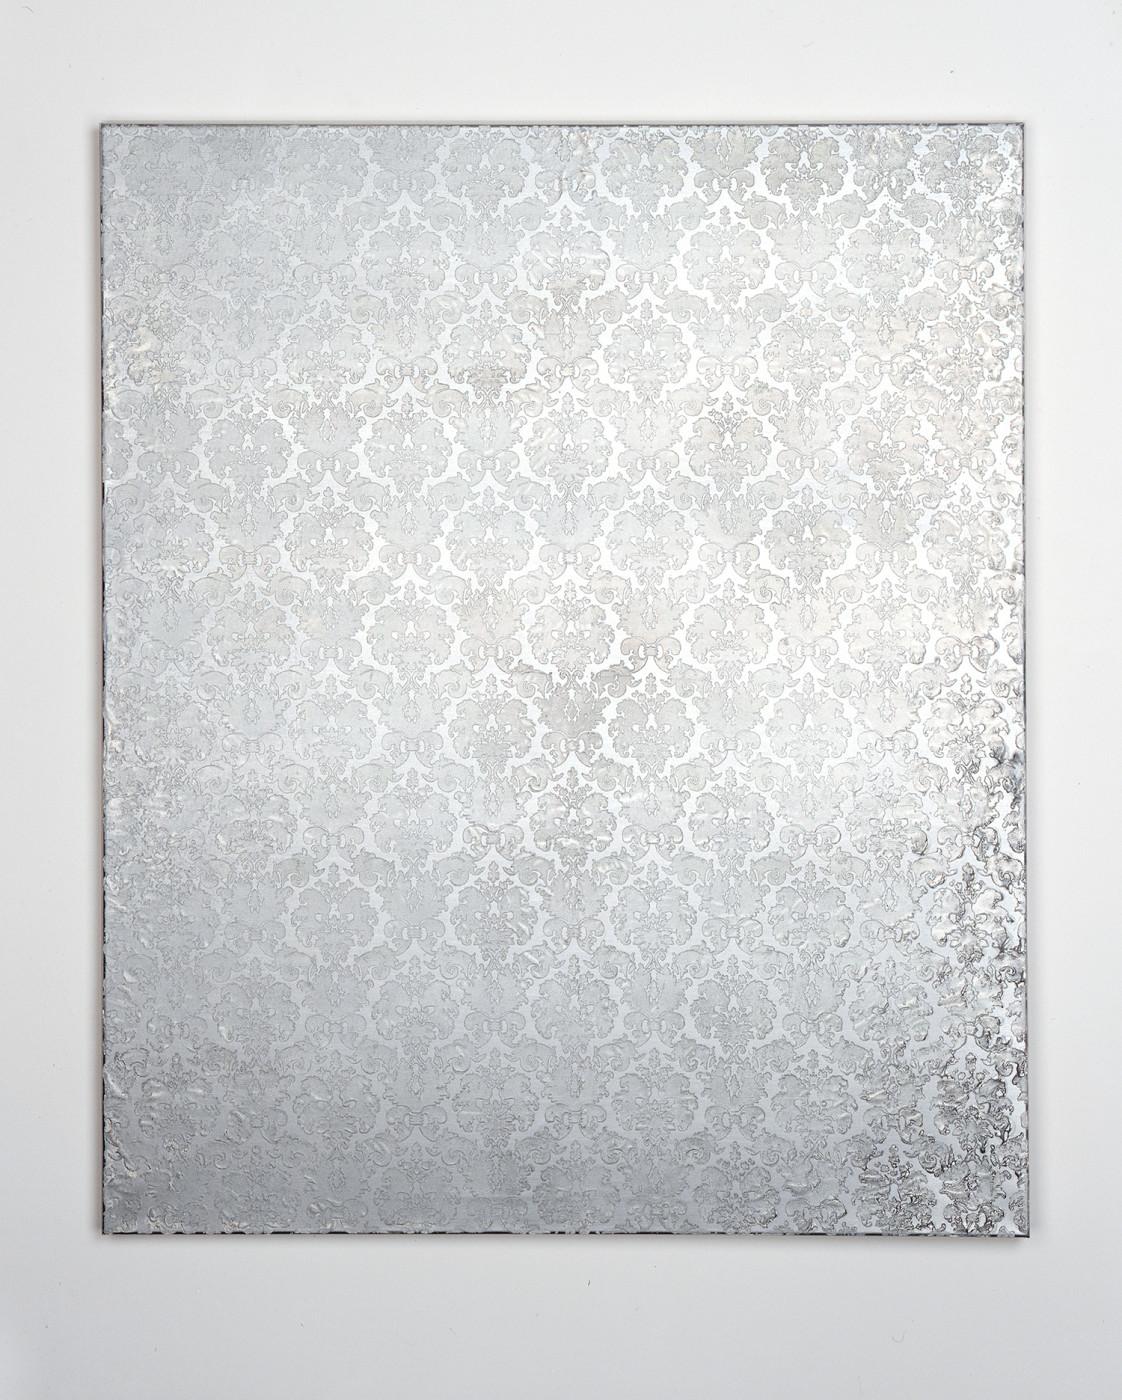 "<div class=""title""><em>Untitled (flock)</em>, 2004</div><div class=""medium"">oil and enamel on canvas</div><div class=""dimensions"">120.0 x 100.0 x 3.5 cm<br />47 1/4 x 39 3/8 x 1 3/8 in.</div>"